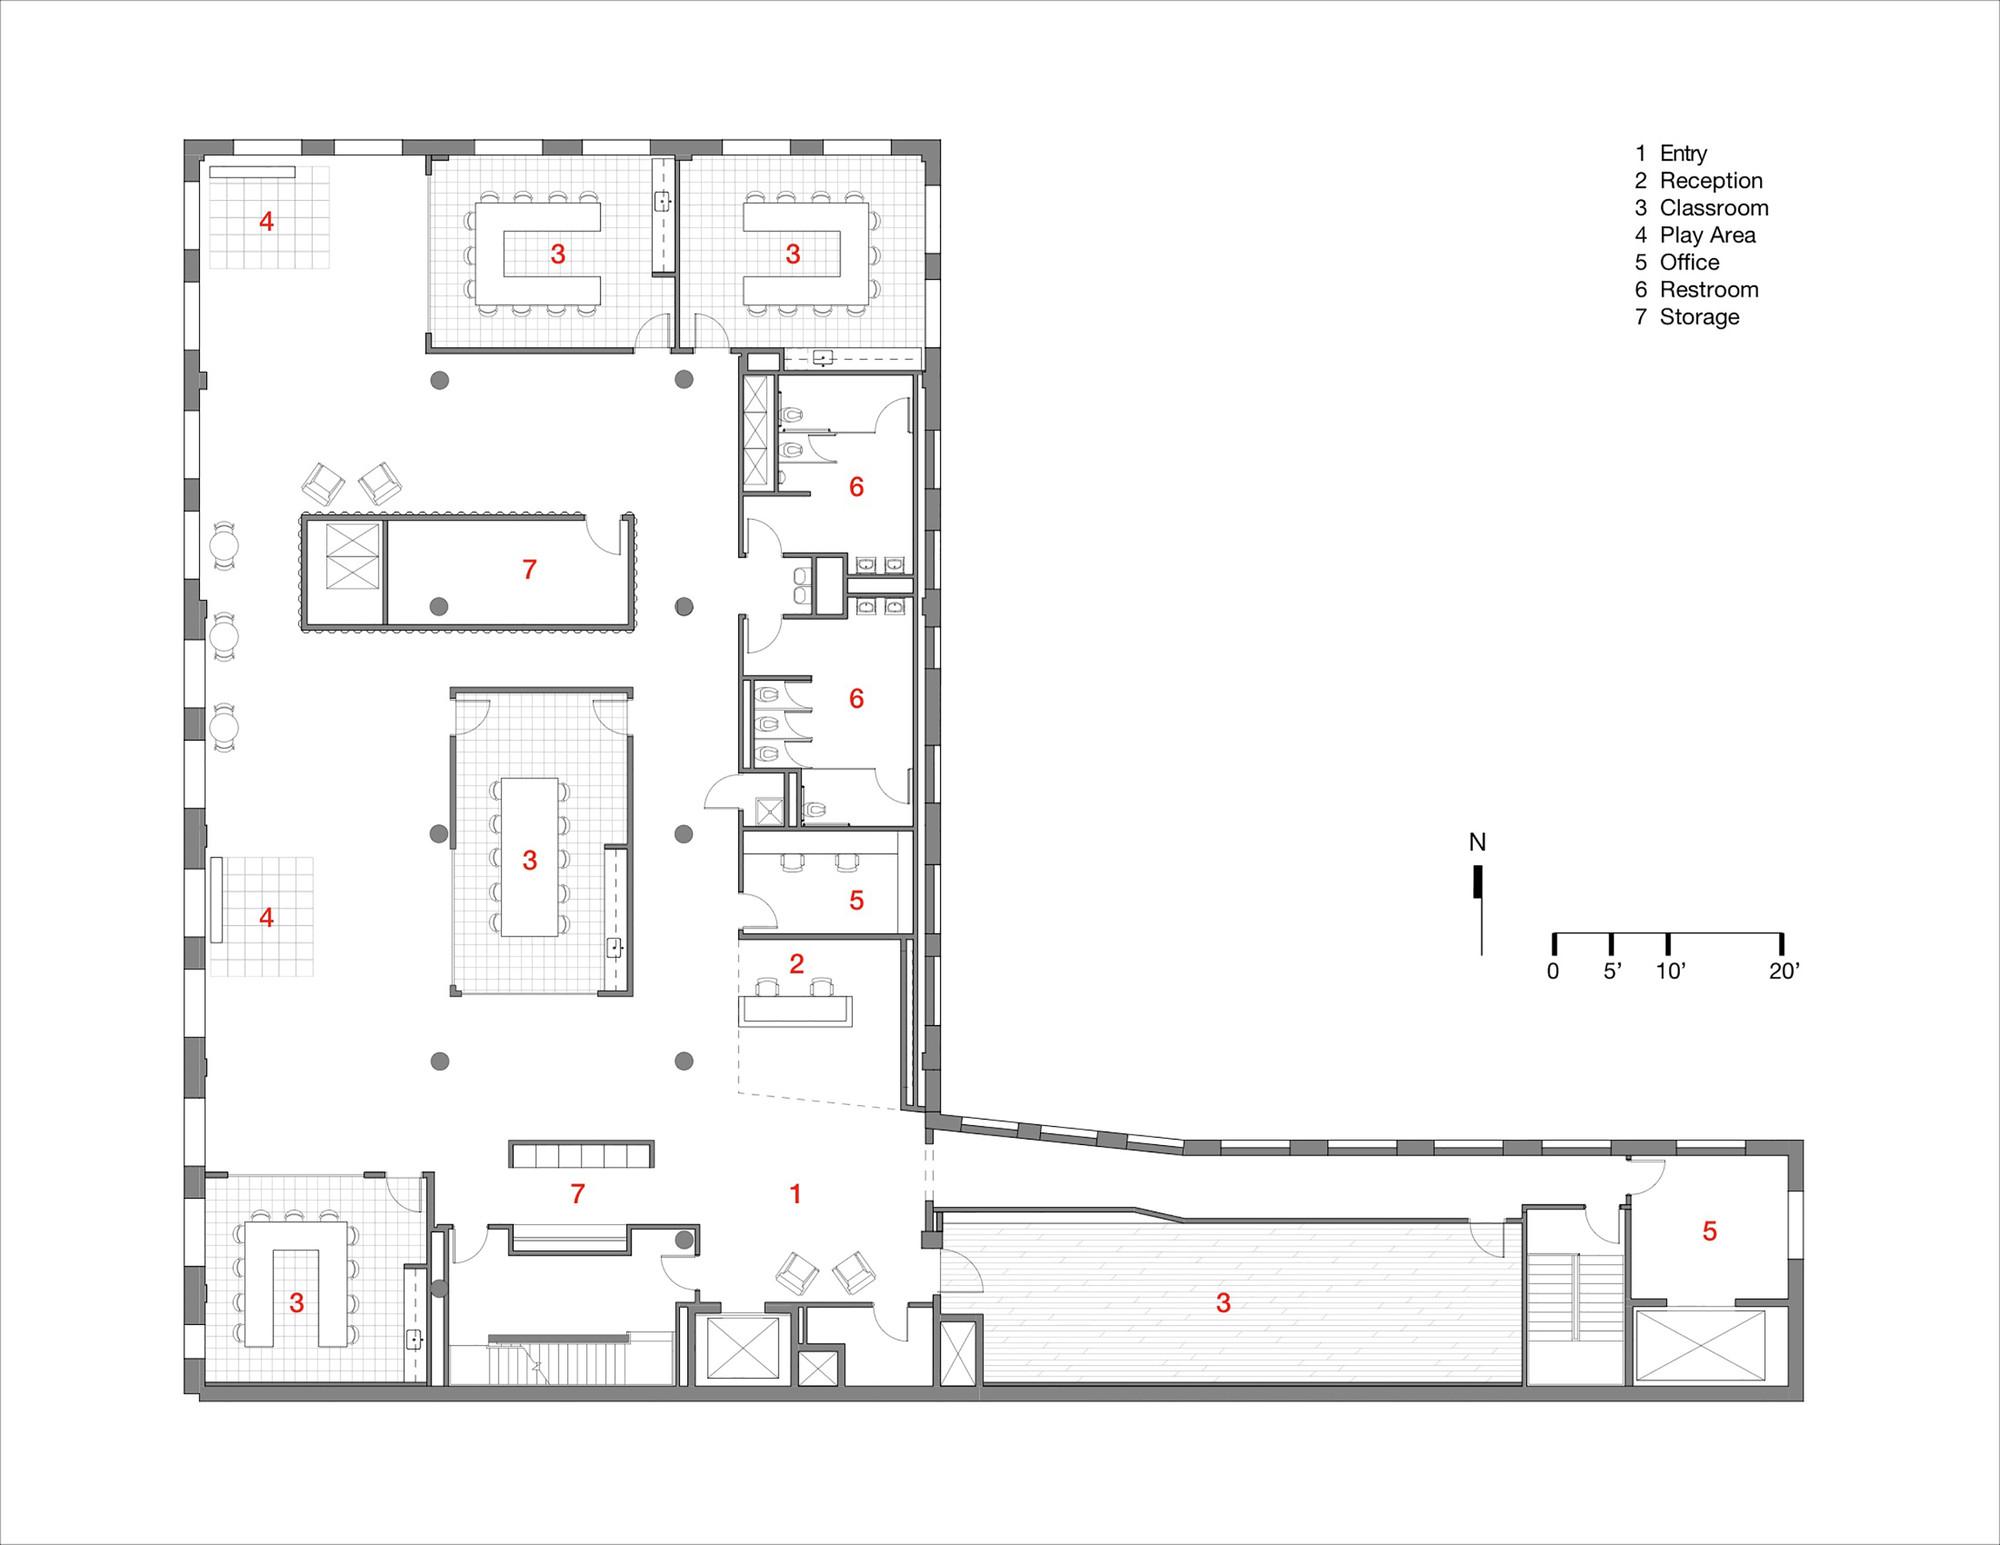 Science Research Floor Plan